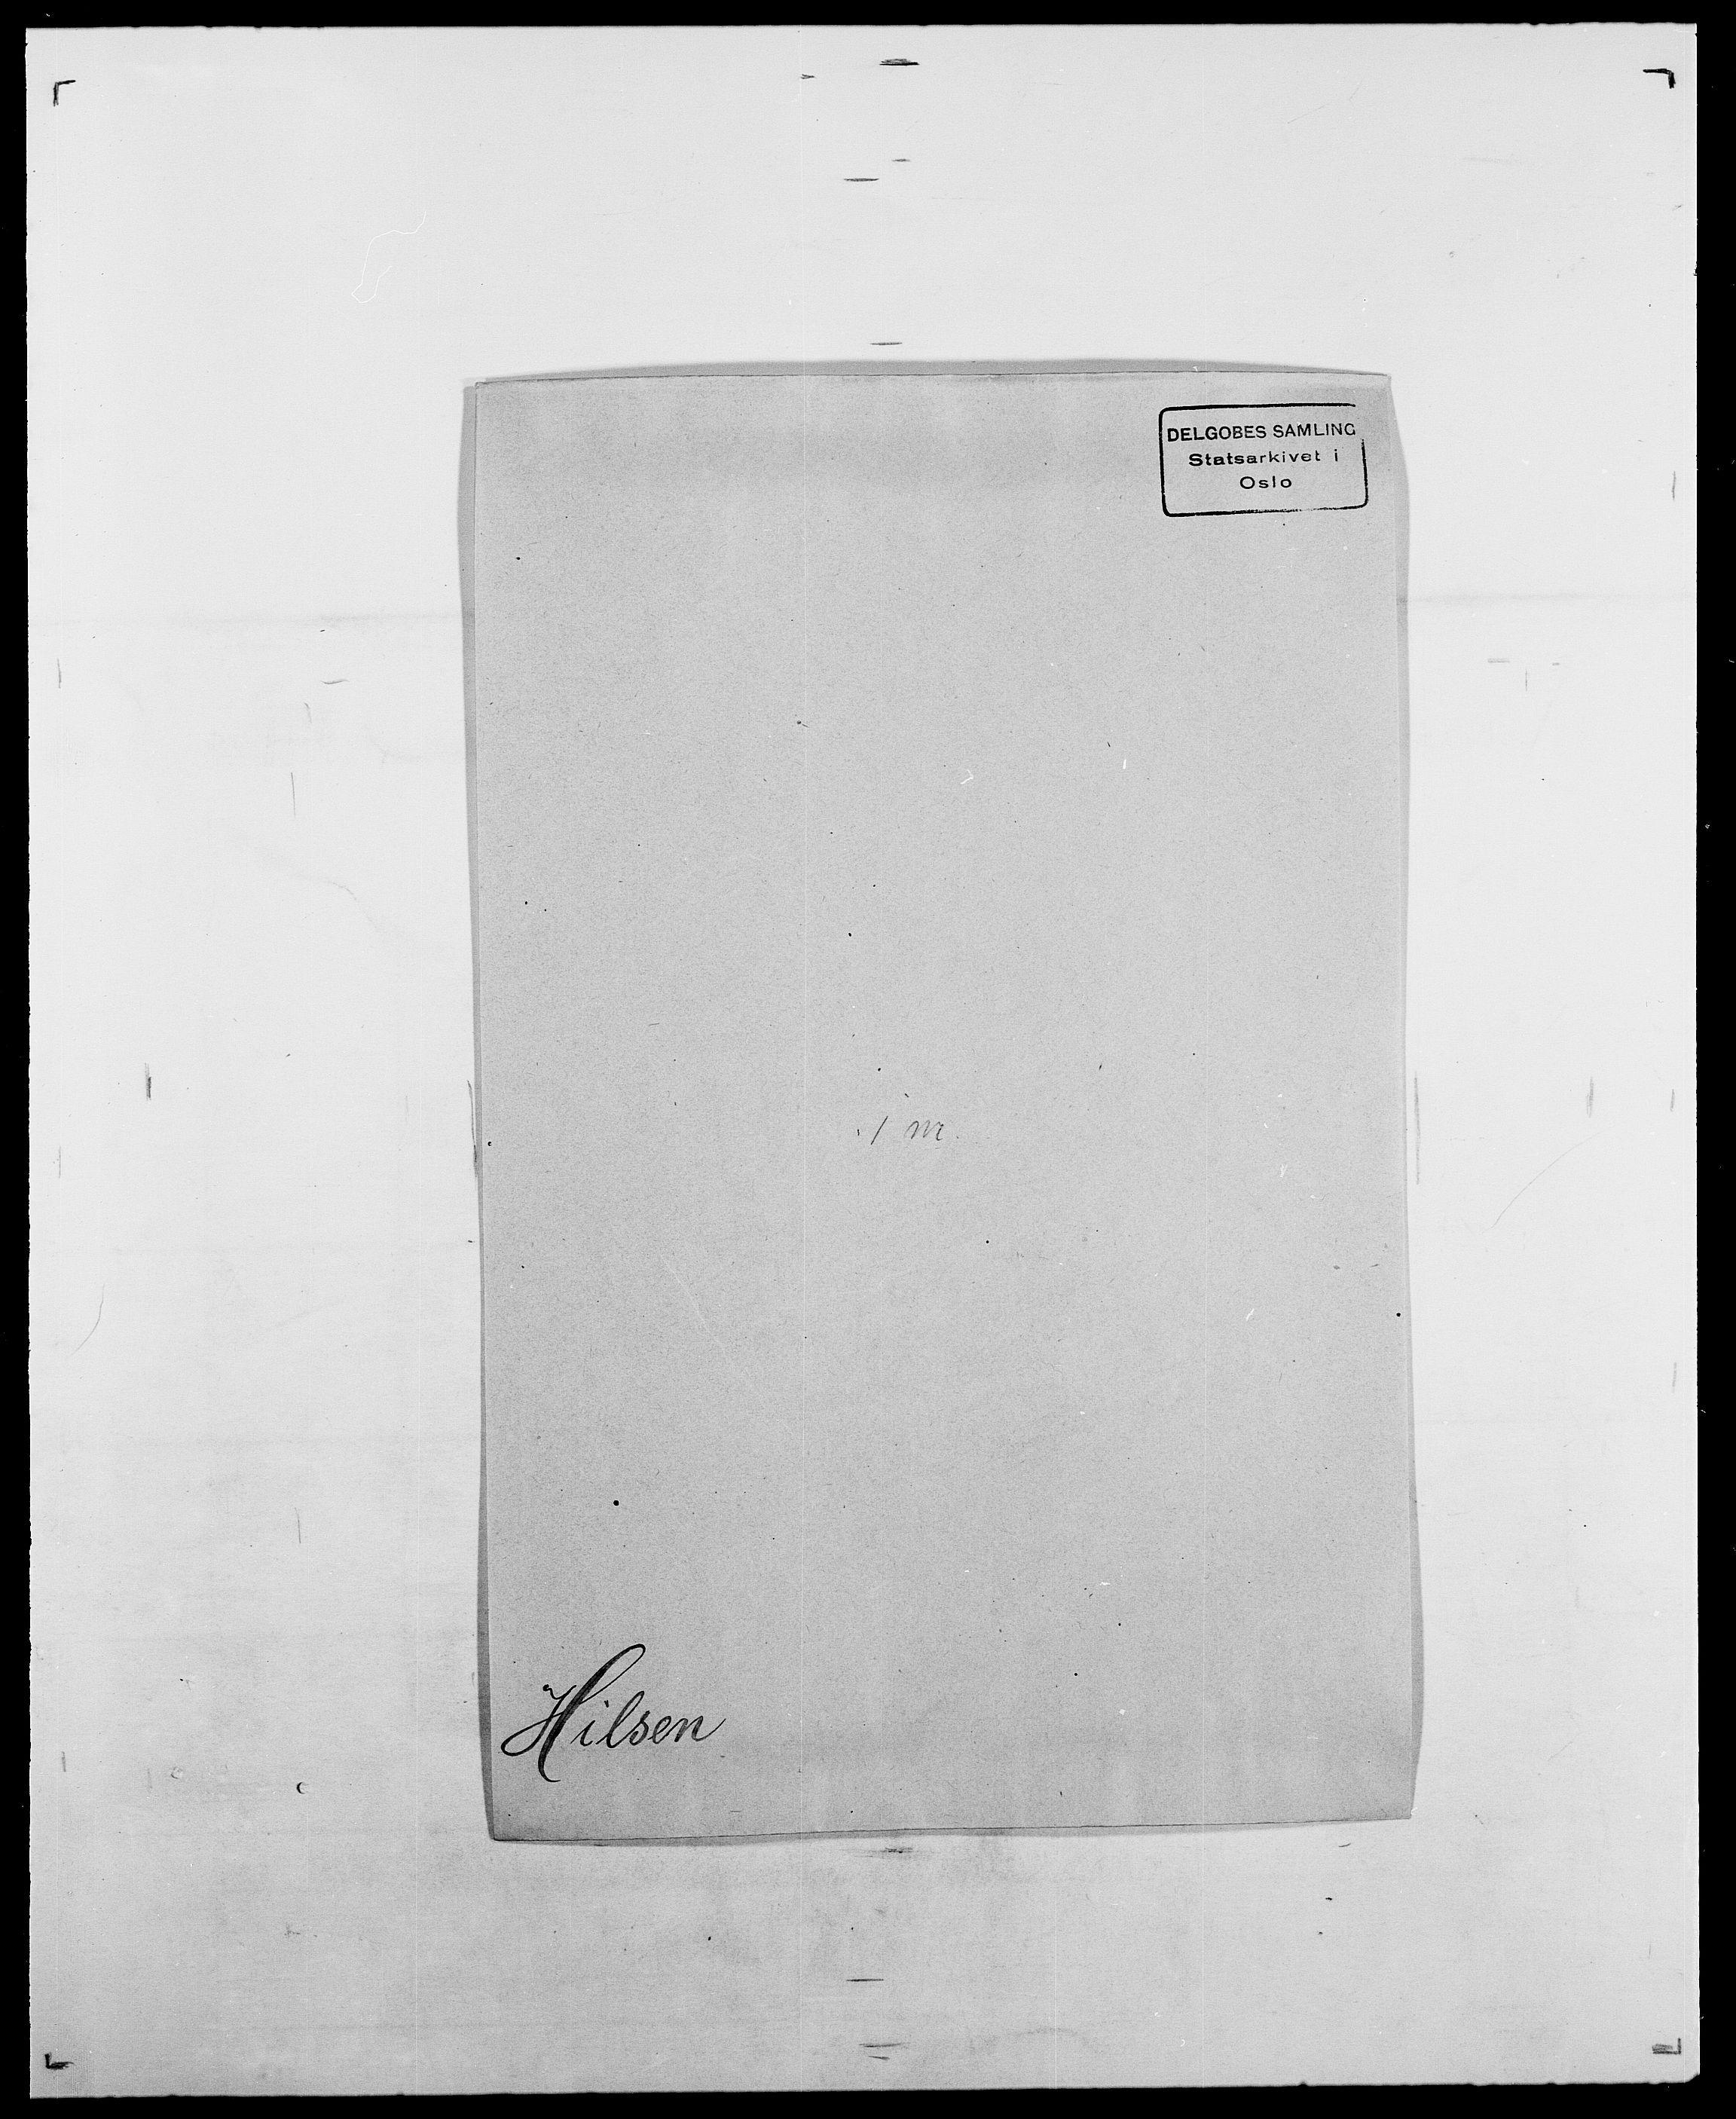 SAO, Delgobe, Charles Antoine - samling, D/Da/L0017: Helander - Hjørne, s. 443